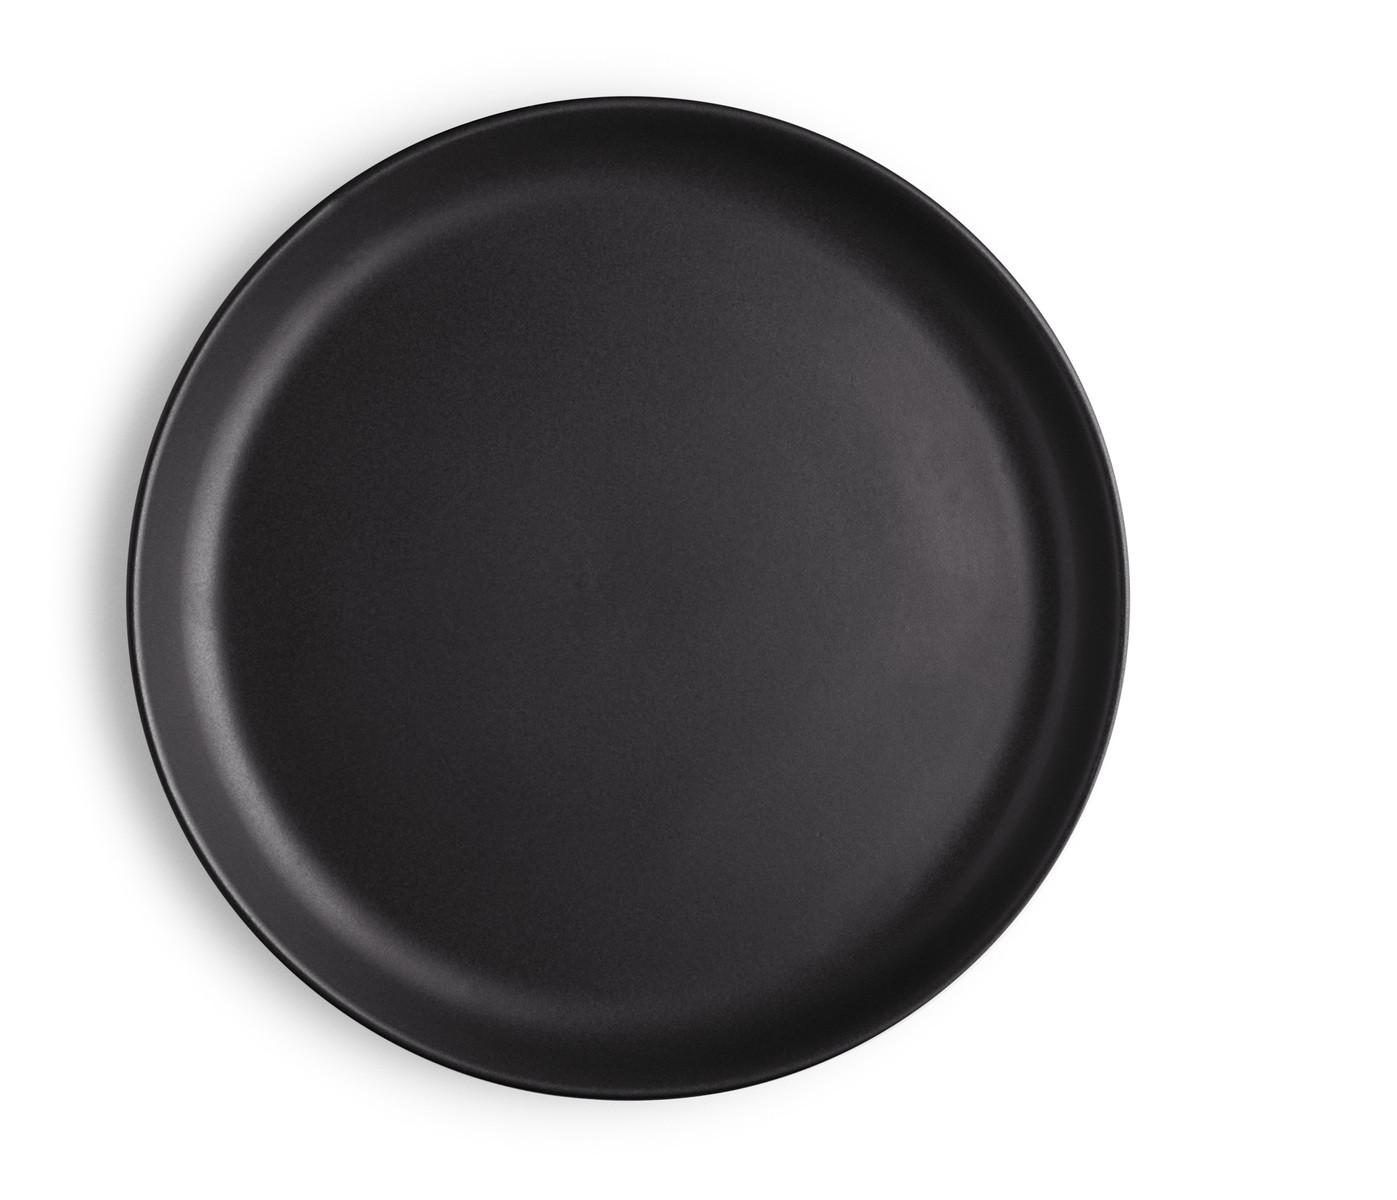 eva solo - Teller 21 cm, 502793, 5706631165495